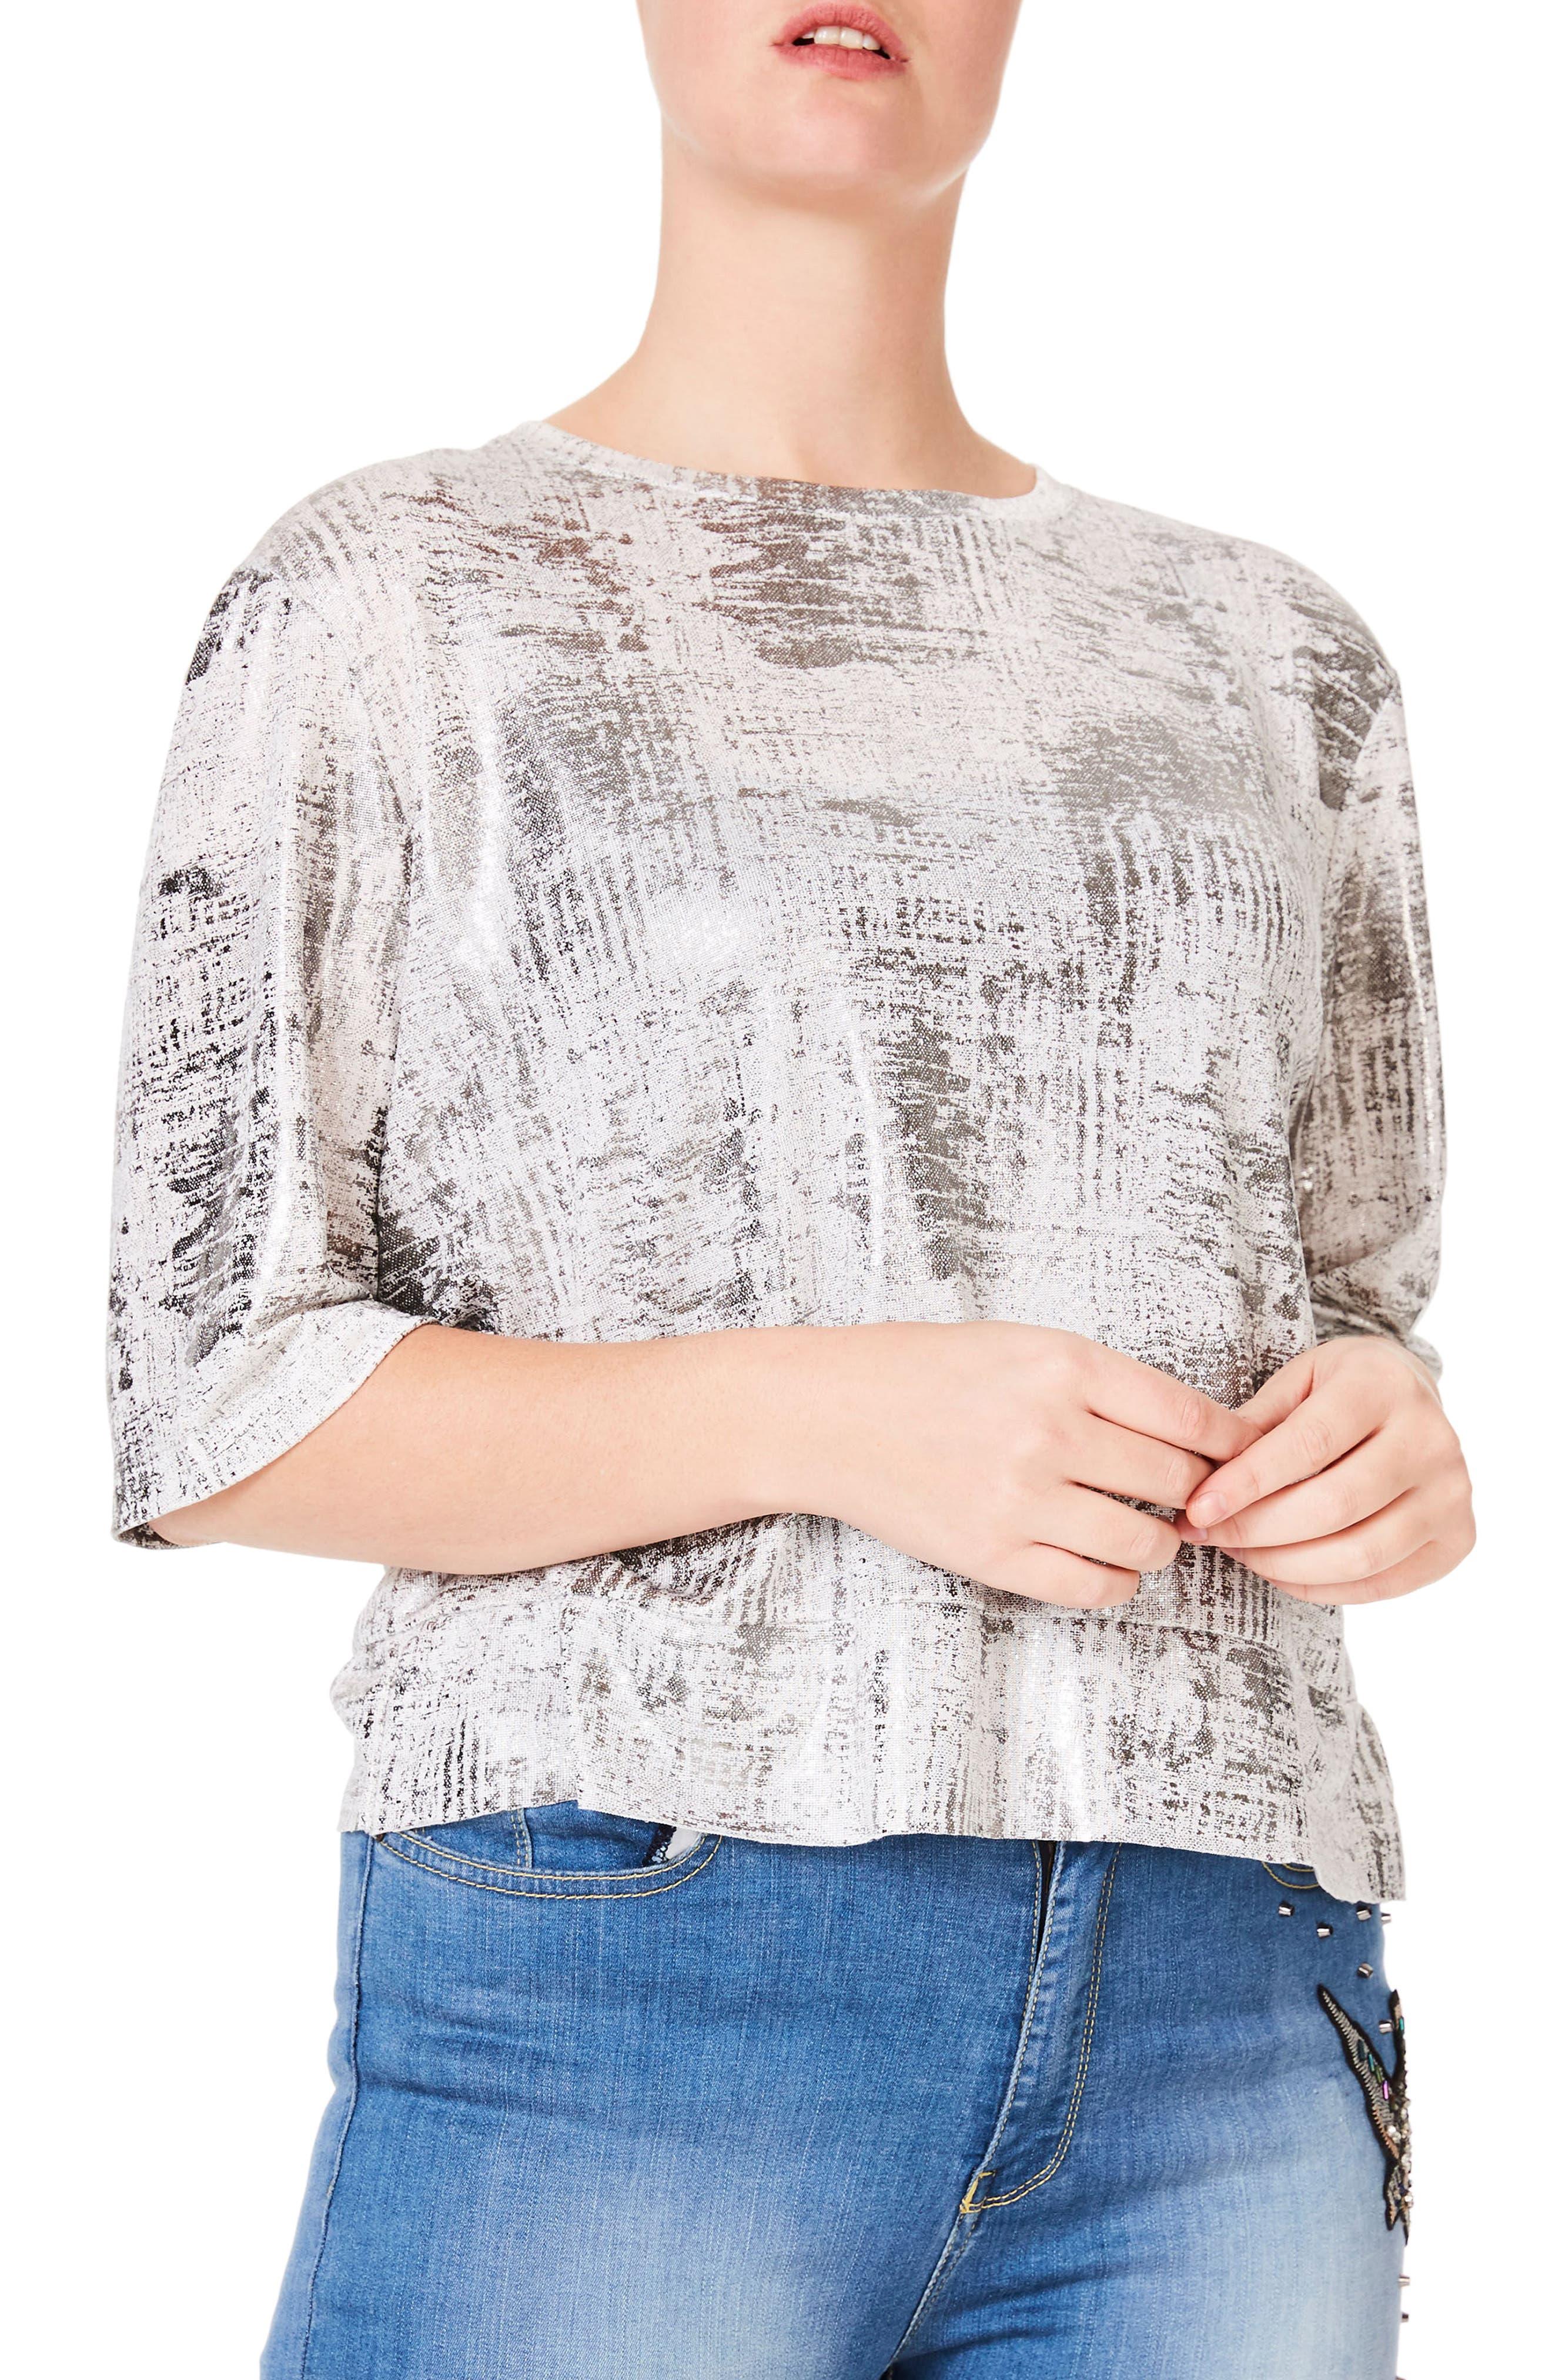 ELVI Metallic Jersey Top (Plus Size)